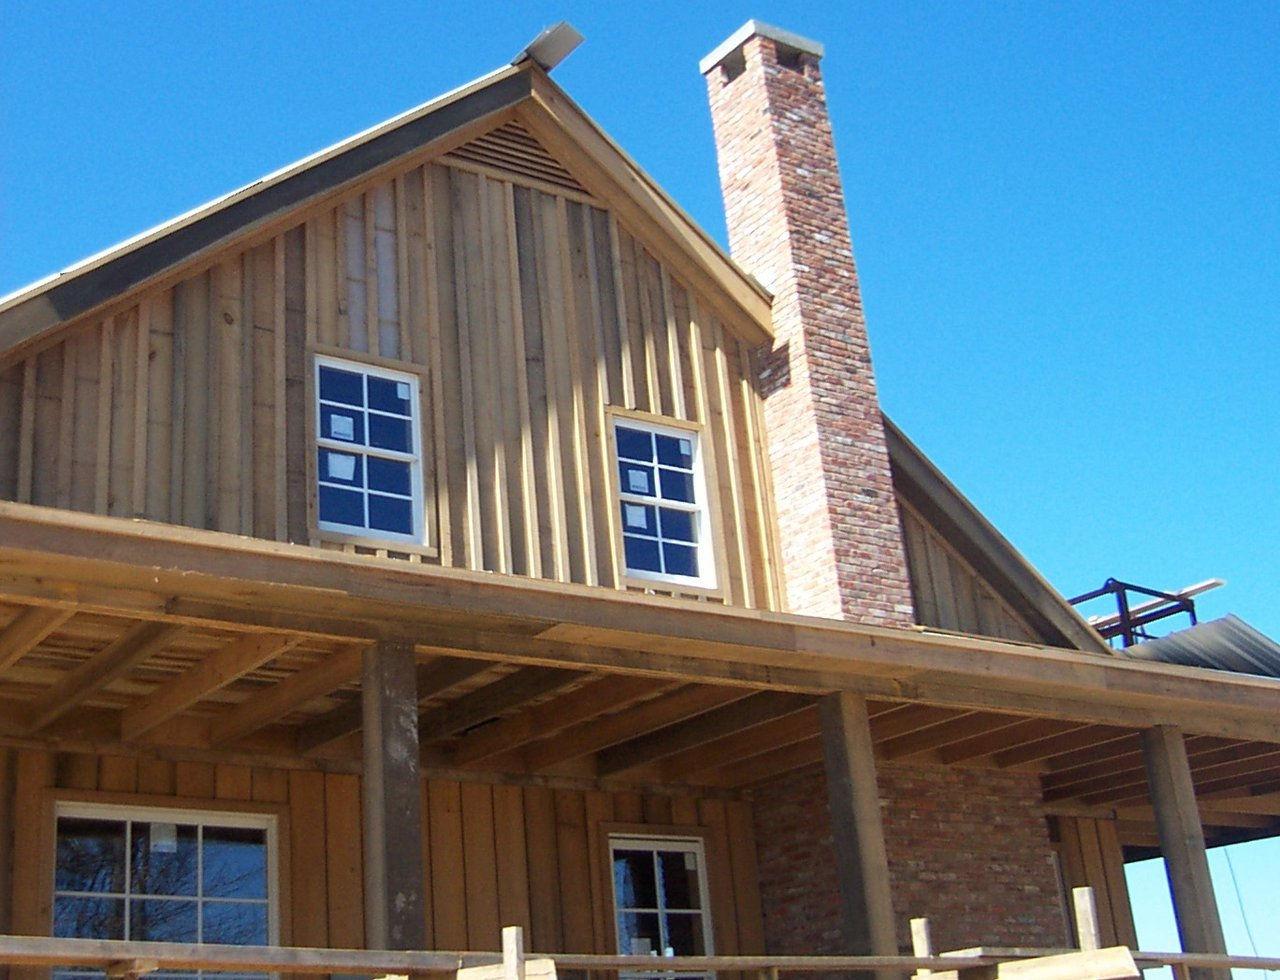 Old river sawmill jim flournoy antique deadhead cypress for Cypress house